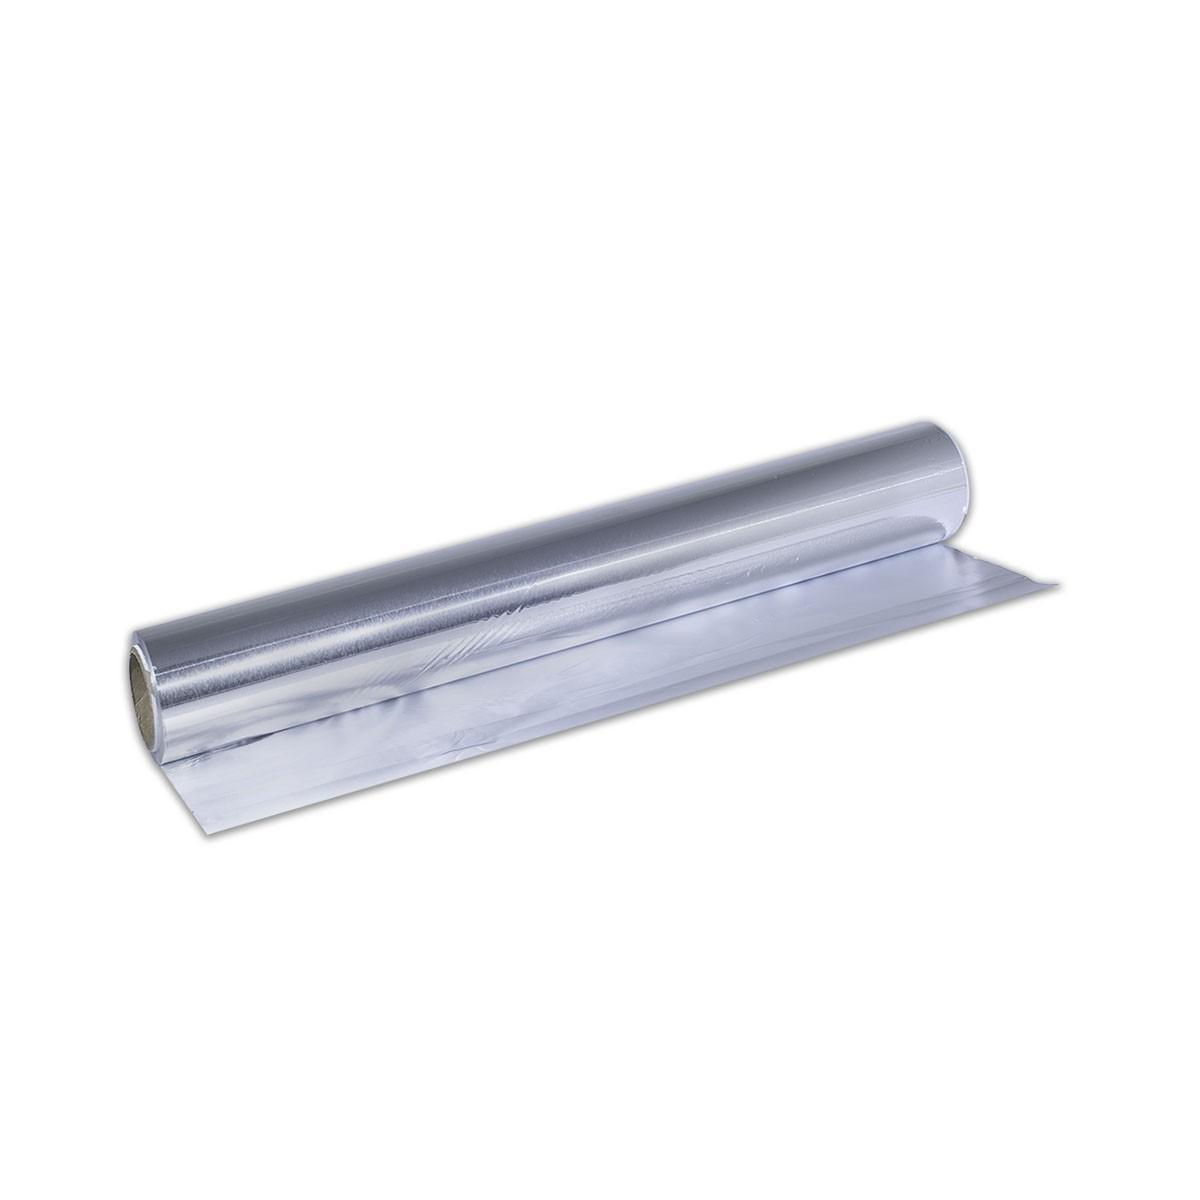 Aluminium Foil 45cmx1000gms - 20mic. | 6rolls